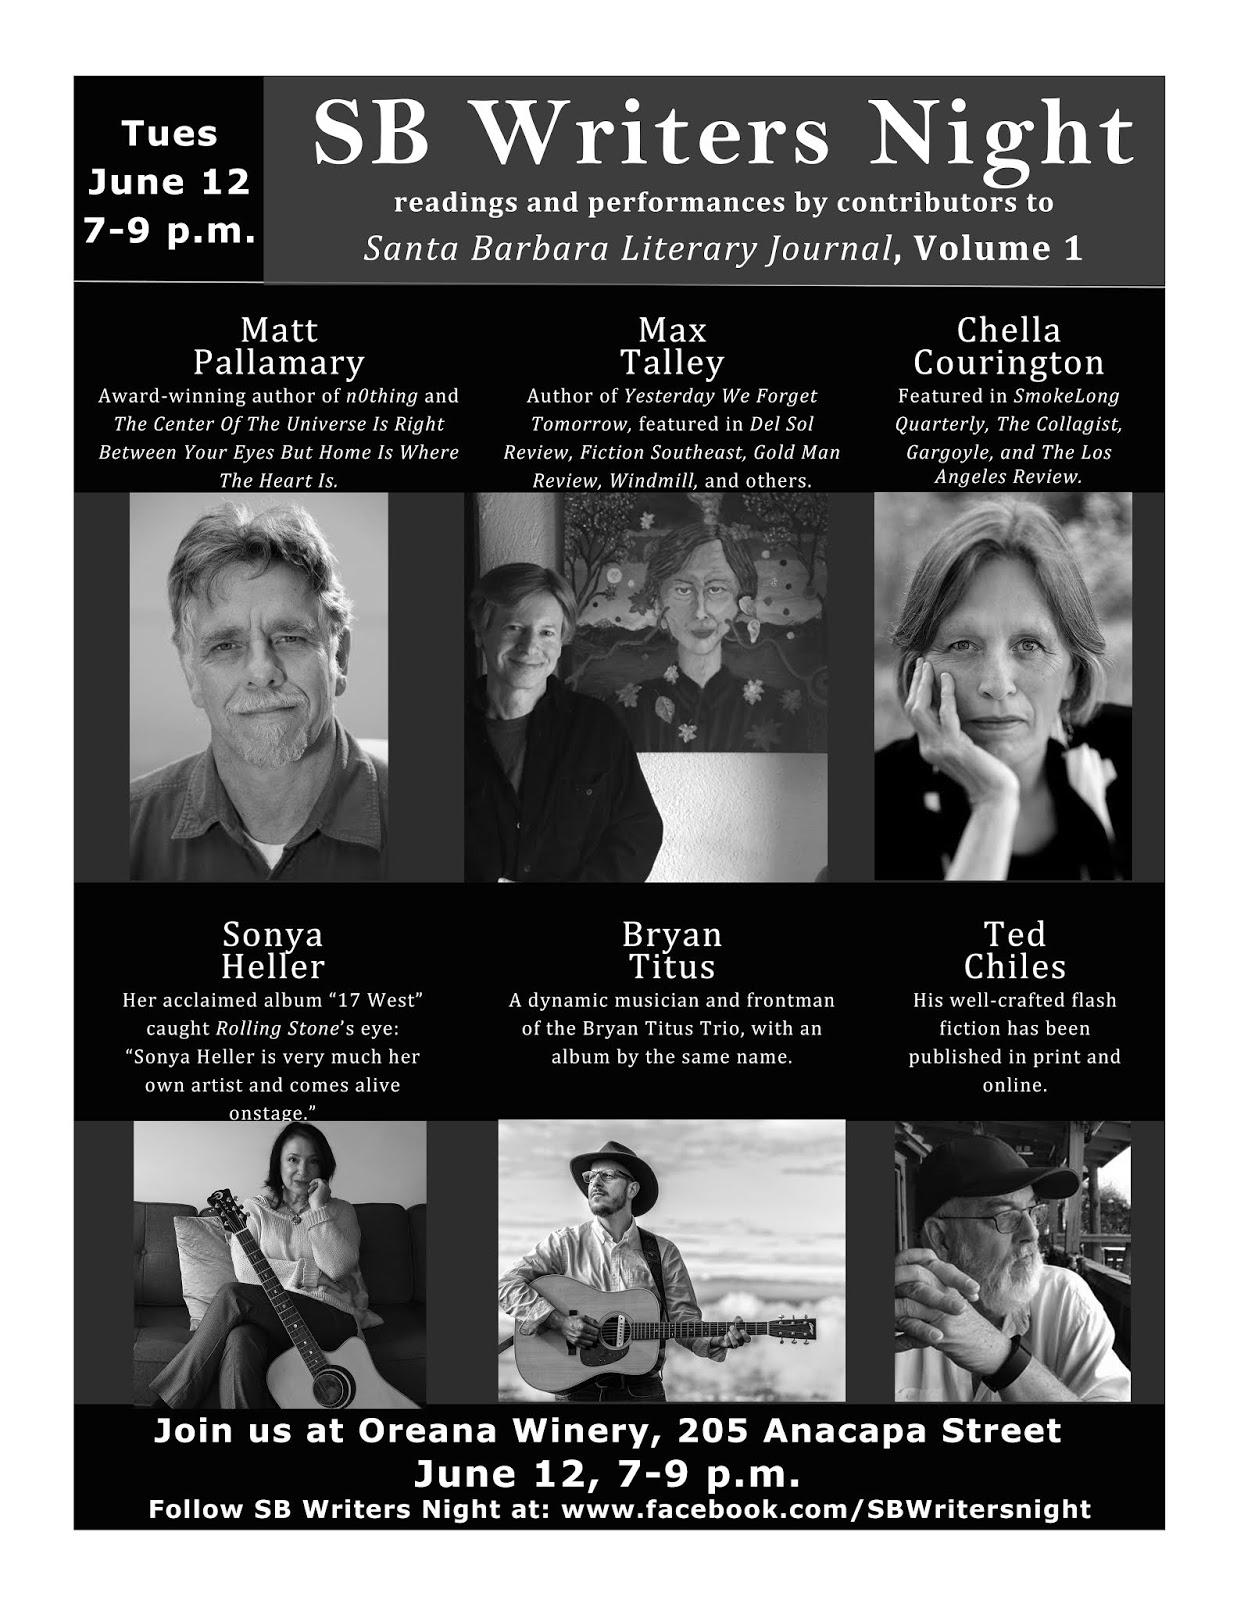 Santa Barbara Literary Journal: Upcoming Event! SB Writers